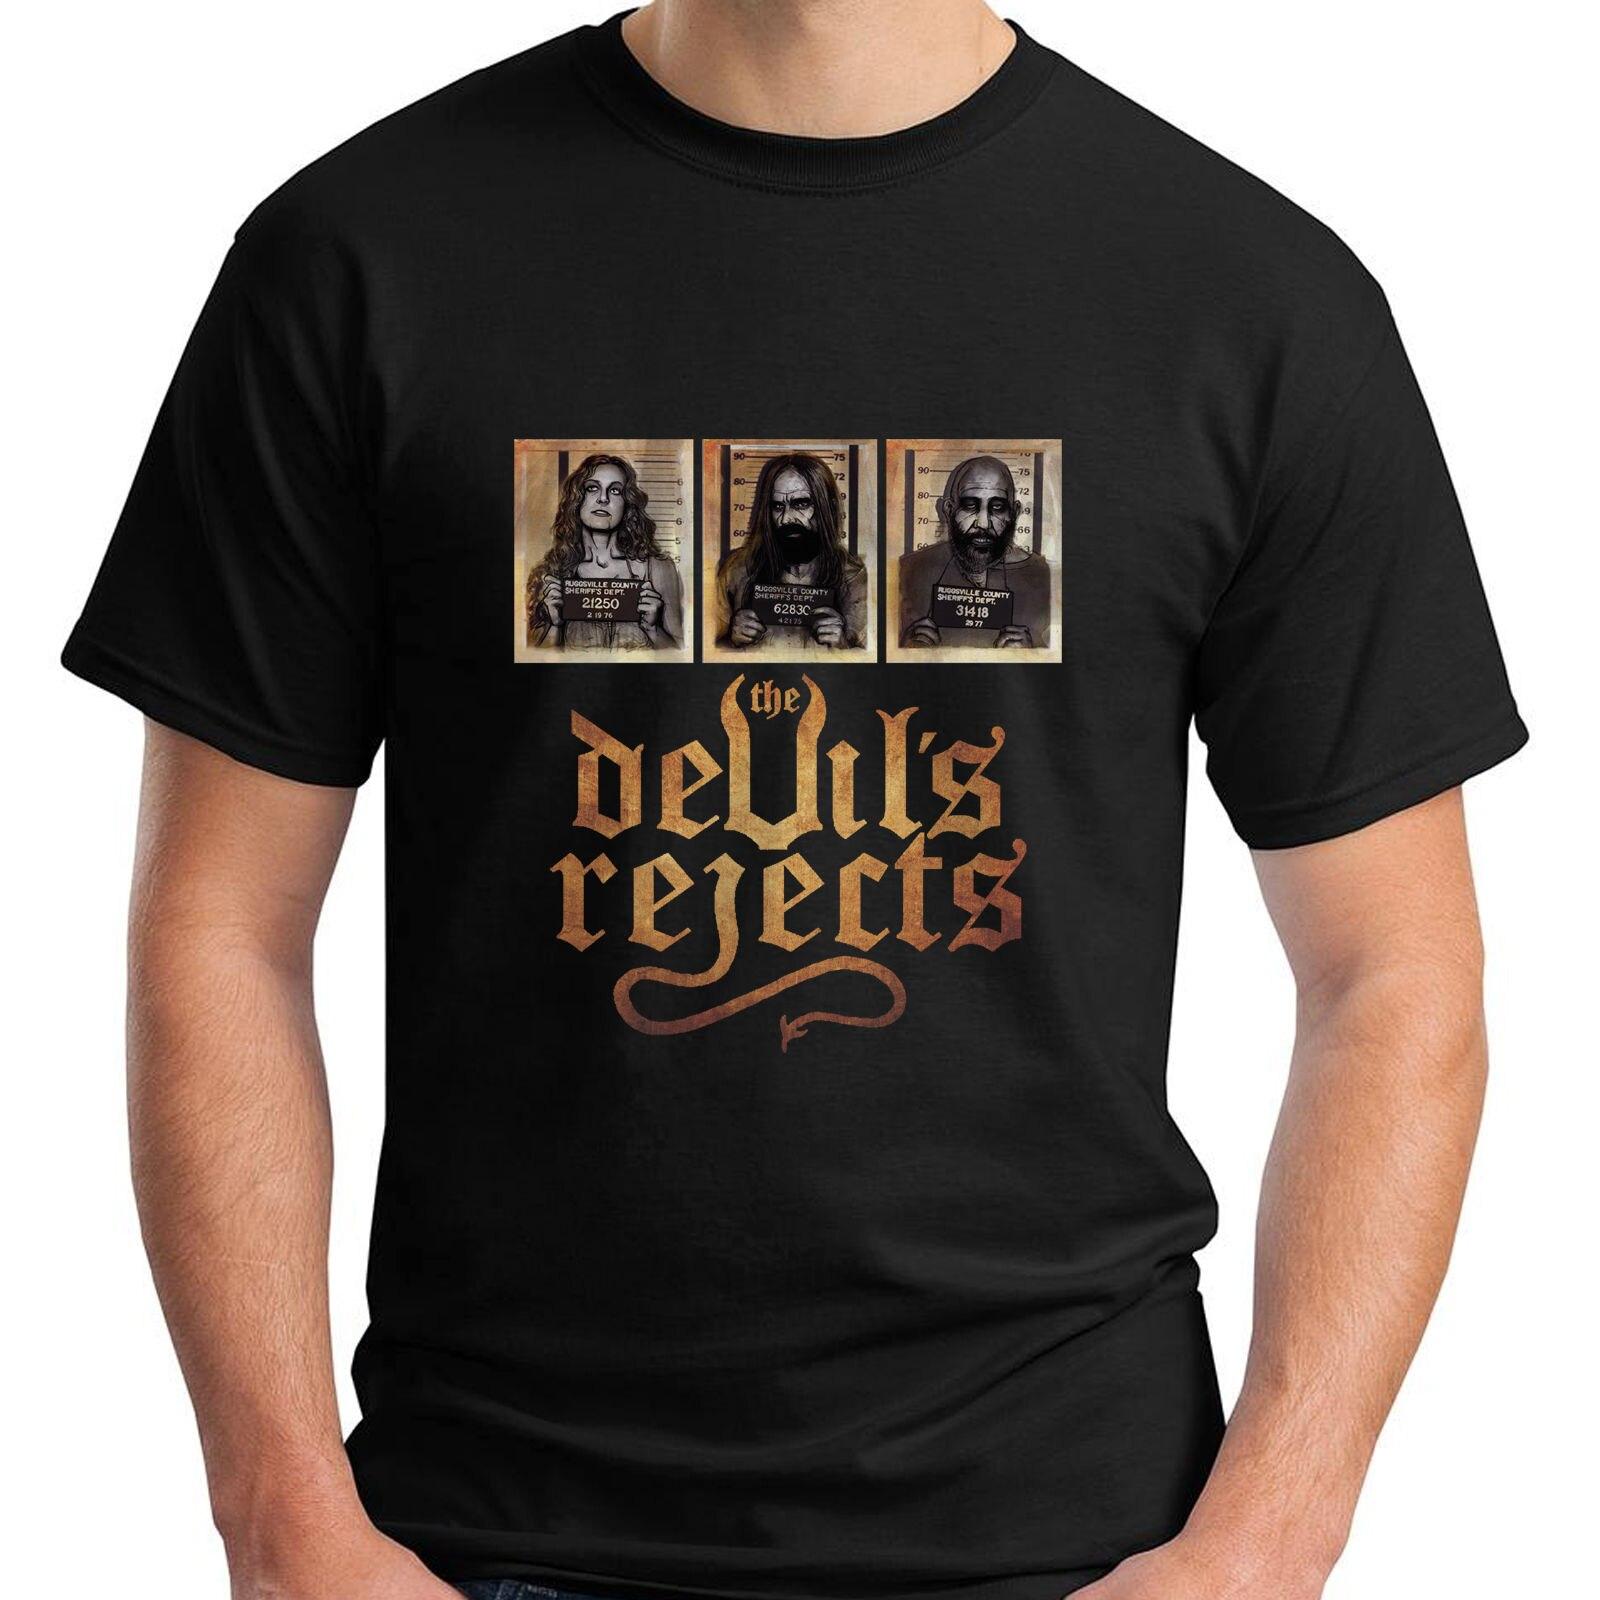 Nuevo capitán Spaulding Devils Reject TV Show camiseta negra para hombres tamaño S a 3XL Stranger Things camiseta impresa Original